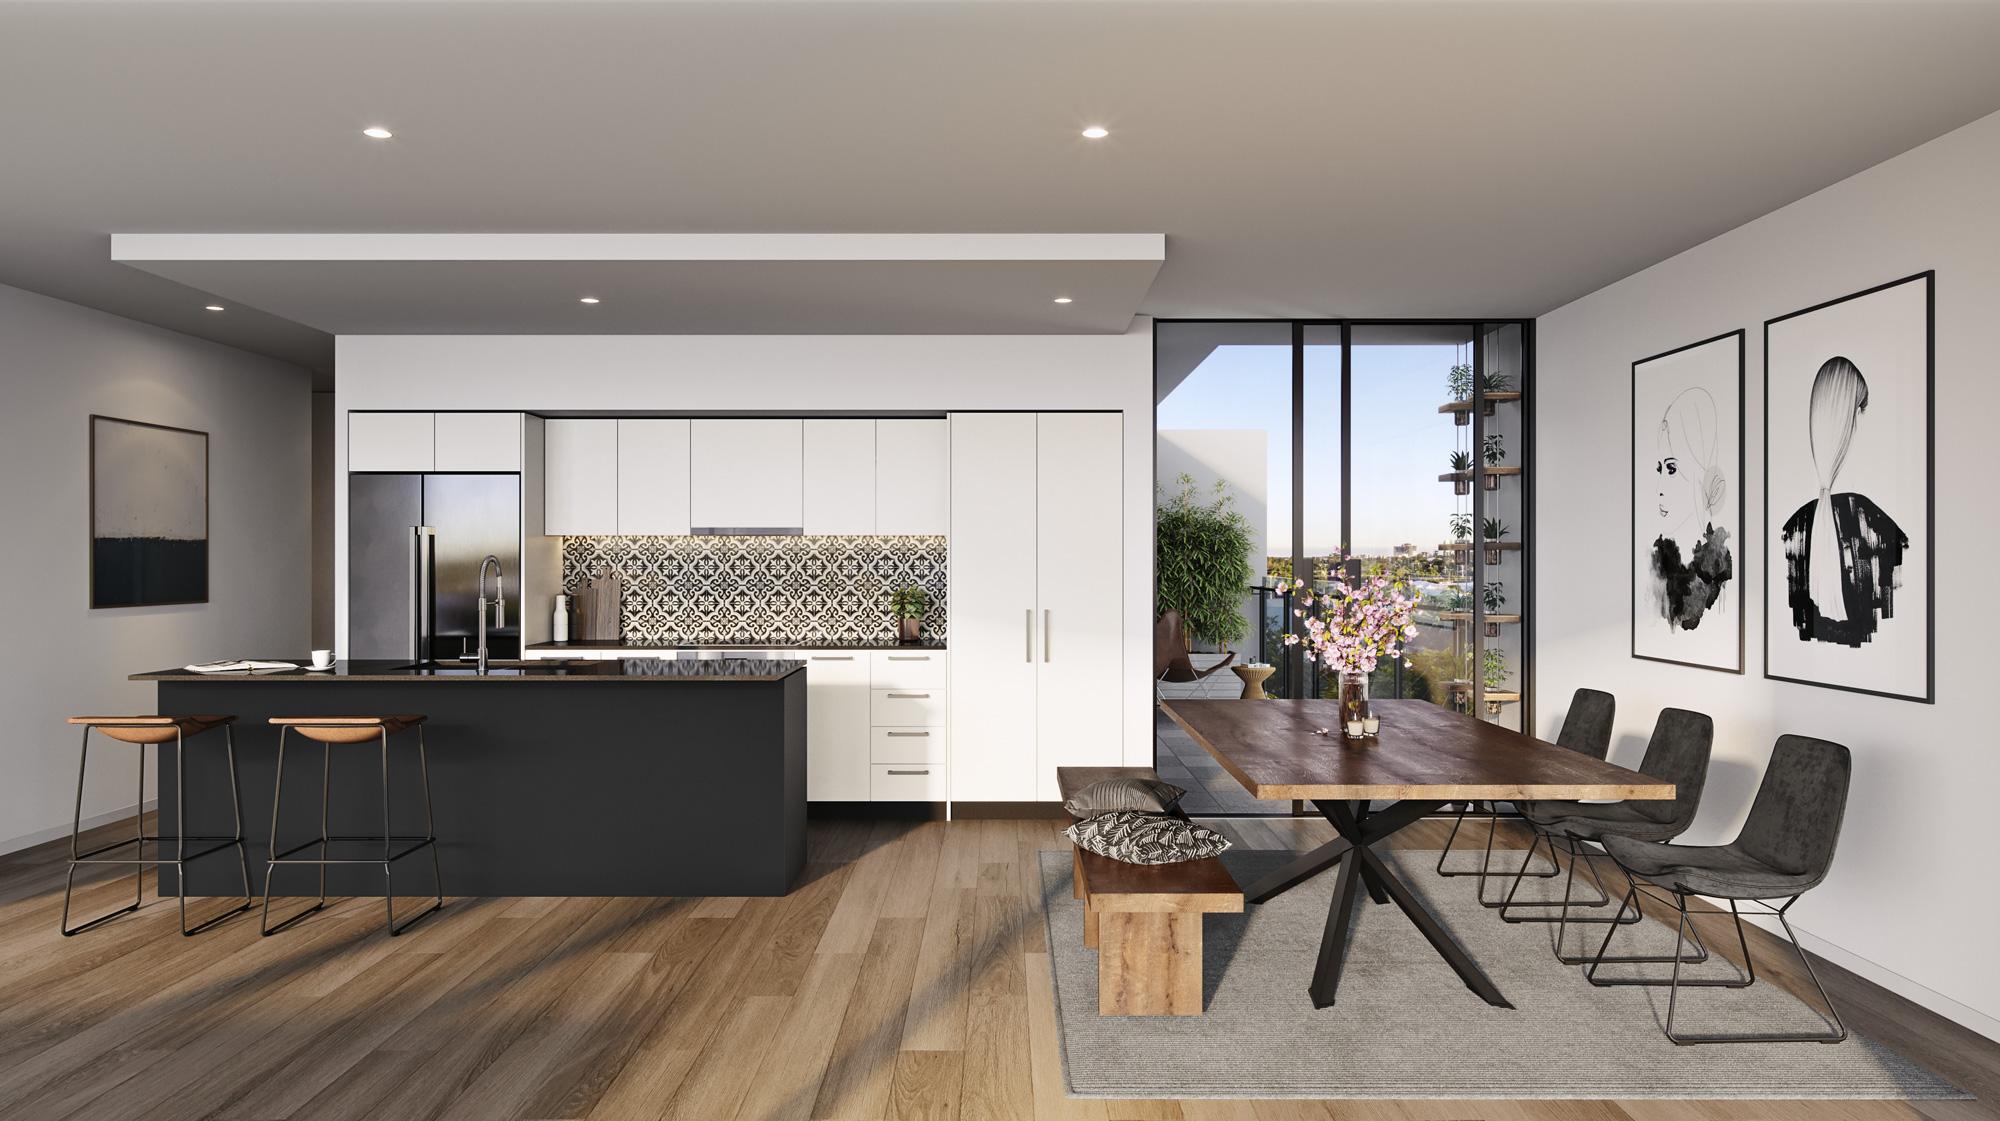 Kitchen_Dining_The_Huxley_5_Chirn_Cresent_Labrador_Chirn_Park.jpg